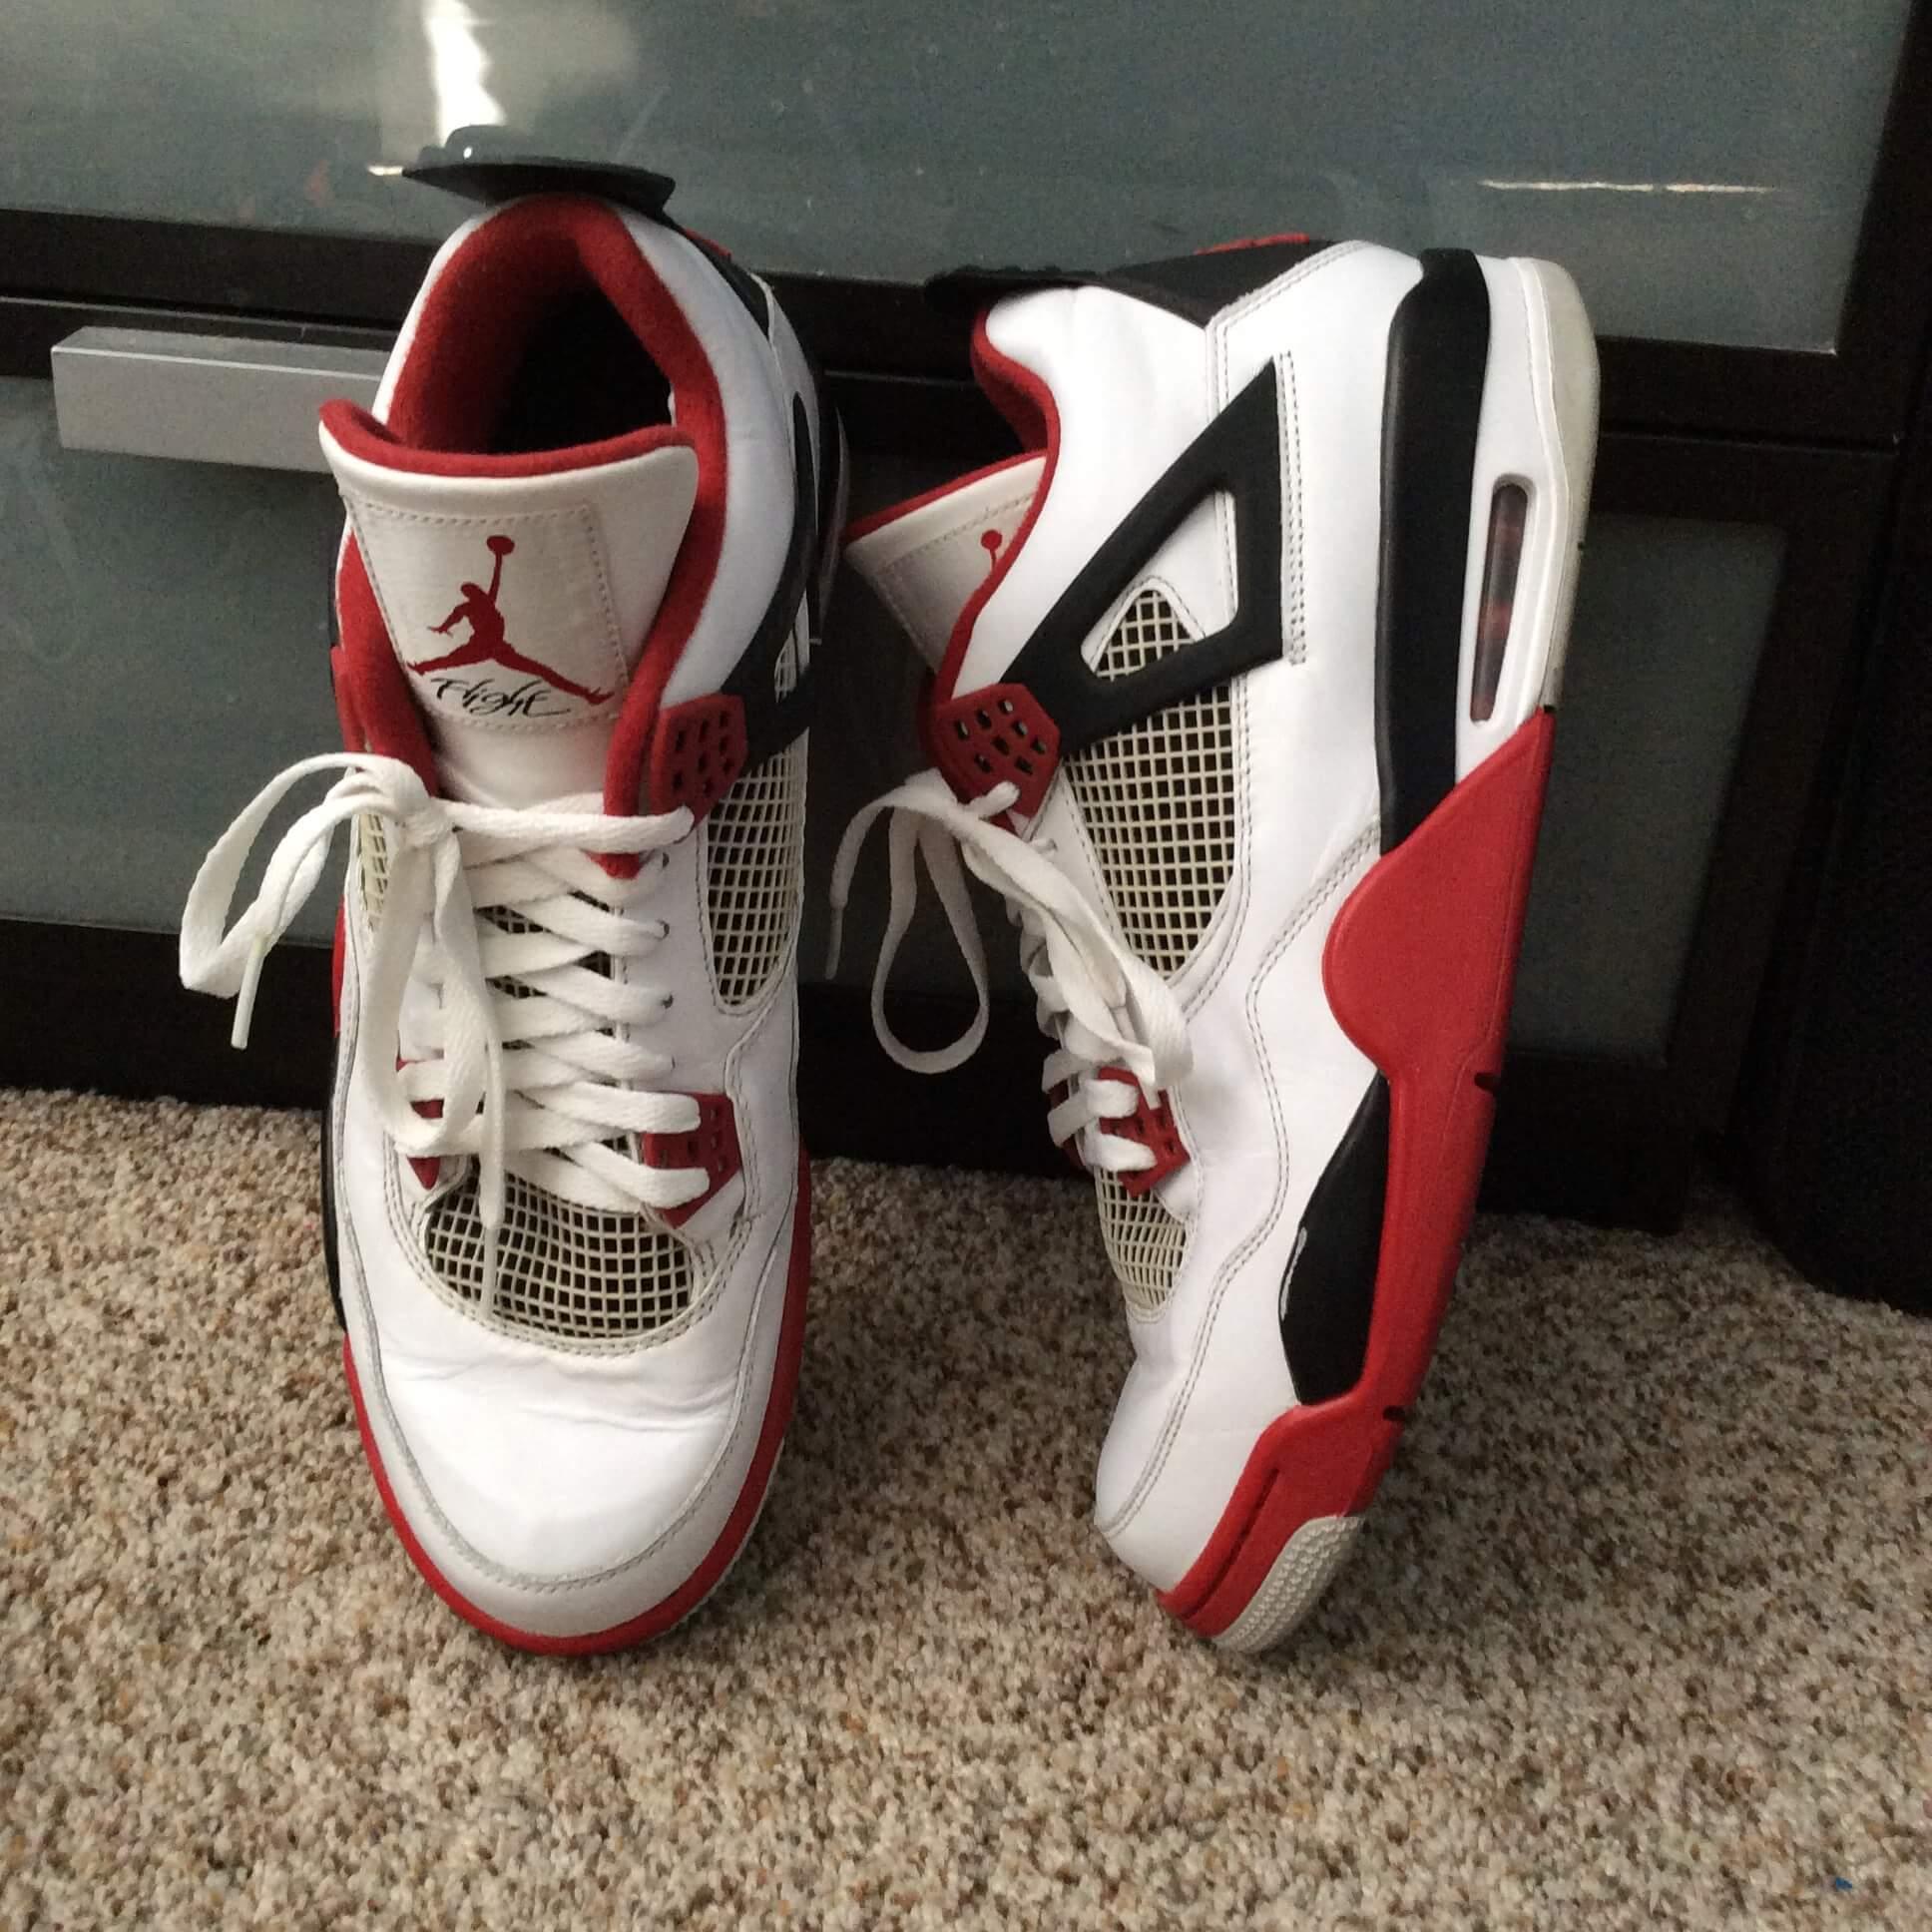 Air Jordan 3 Retro Stealth Varsty Red Black White shoes